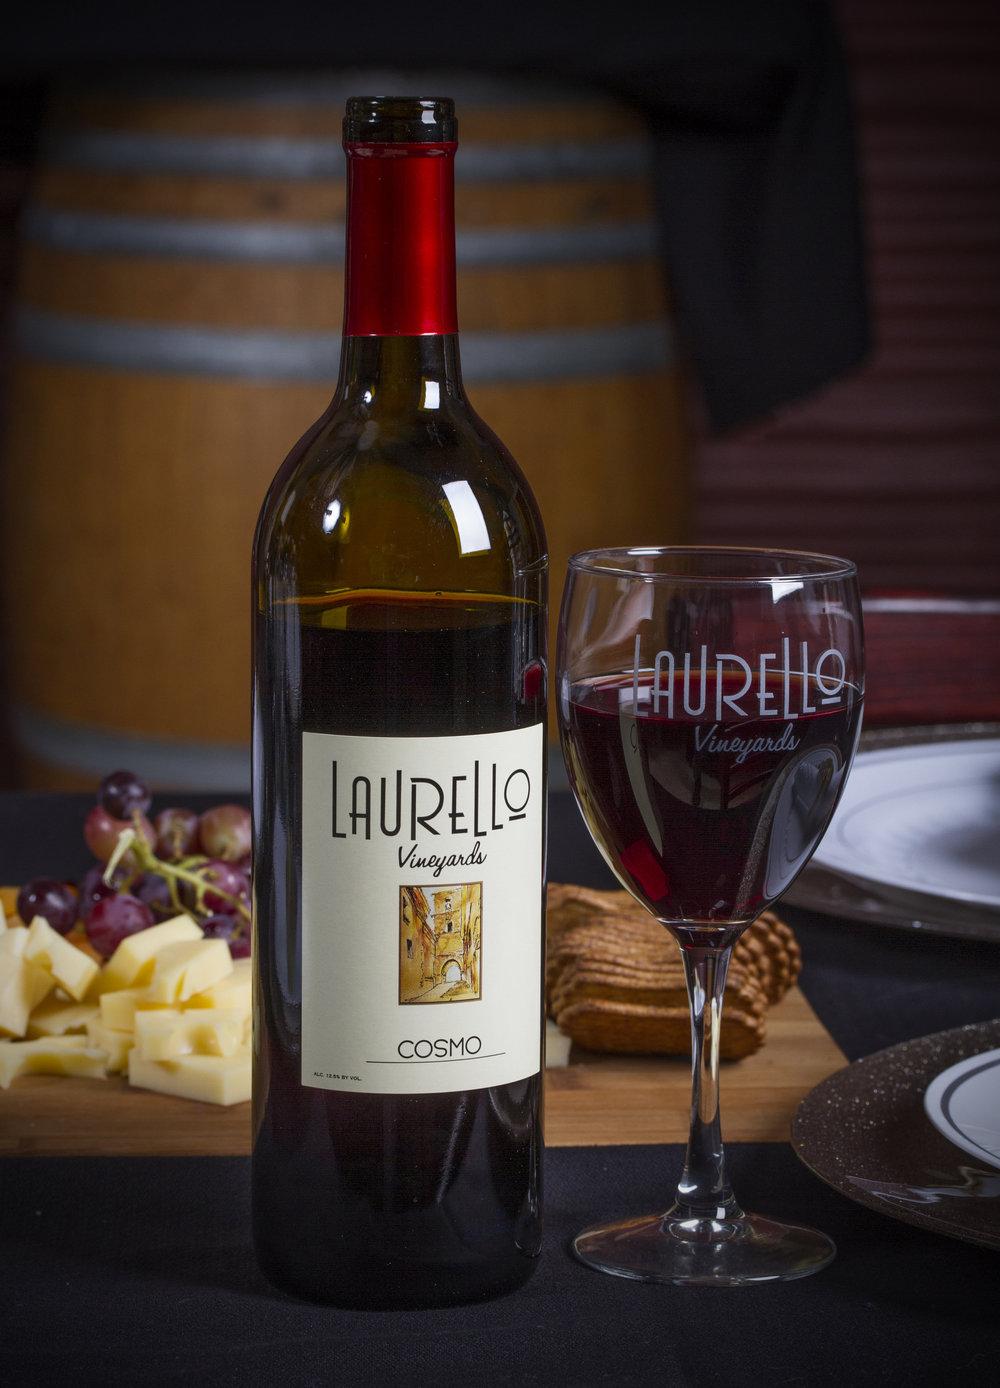 laurello_cosmo_red_wine_HI.jpg